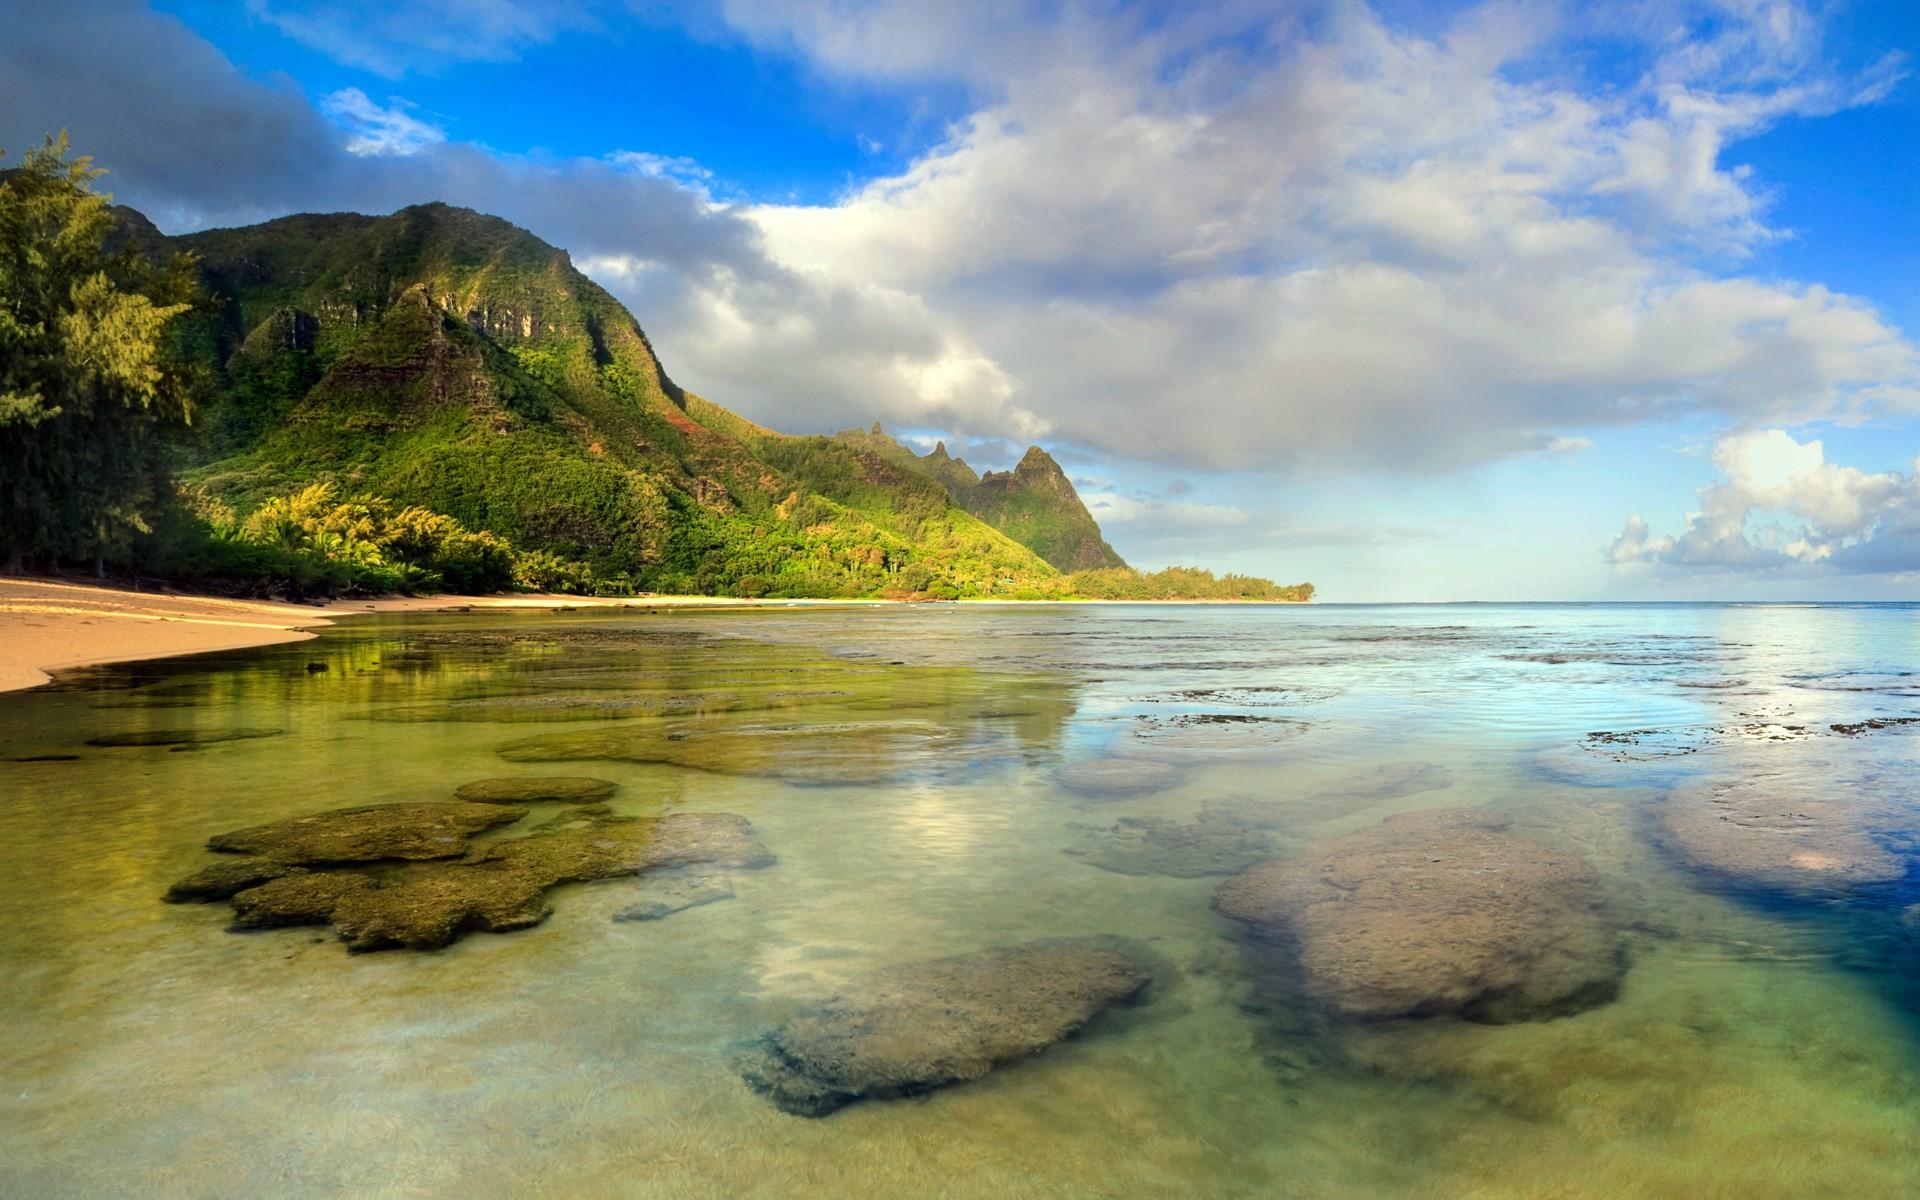 hawaii wallpaper backgrounds hd